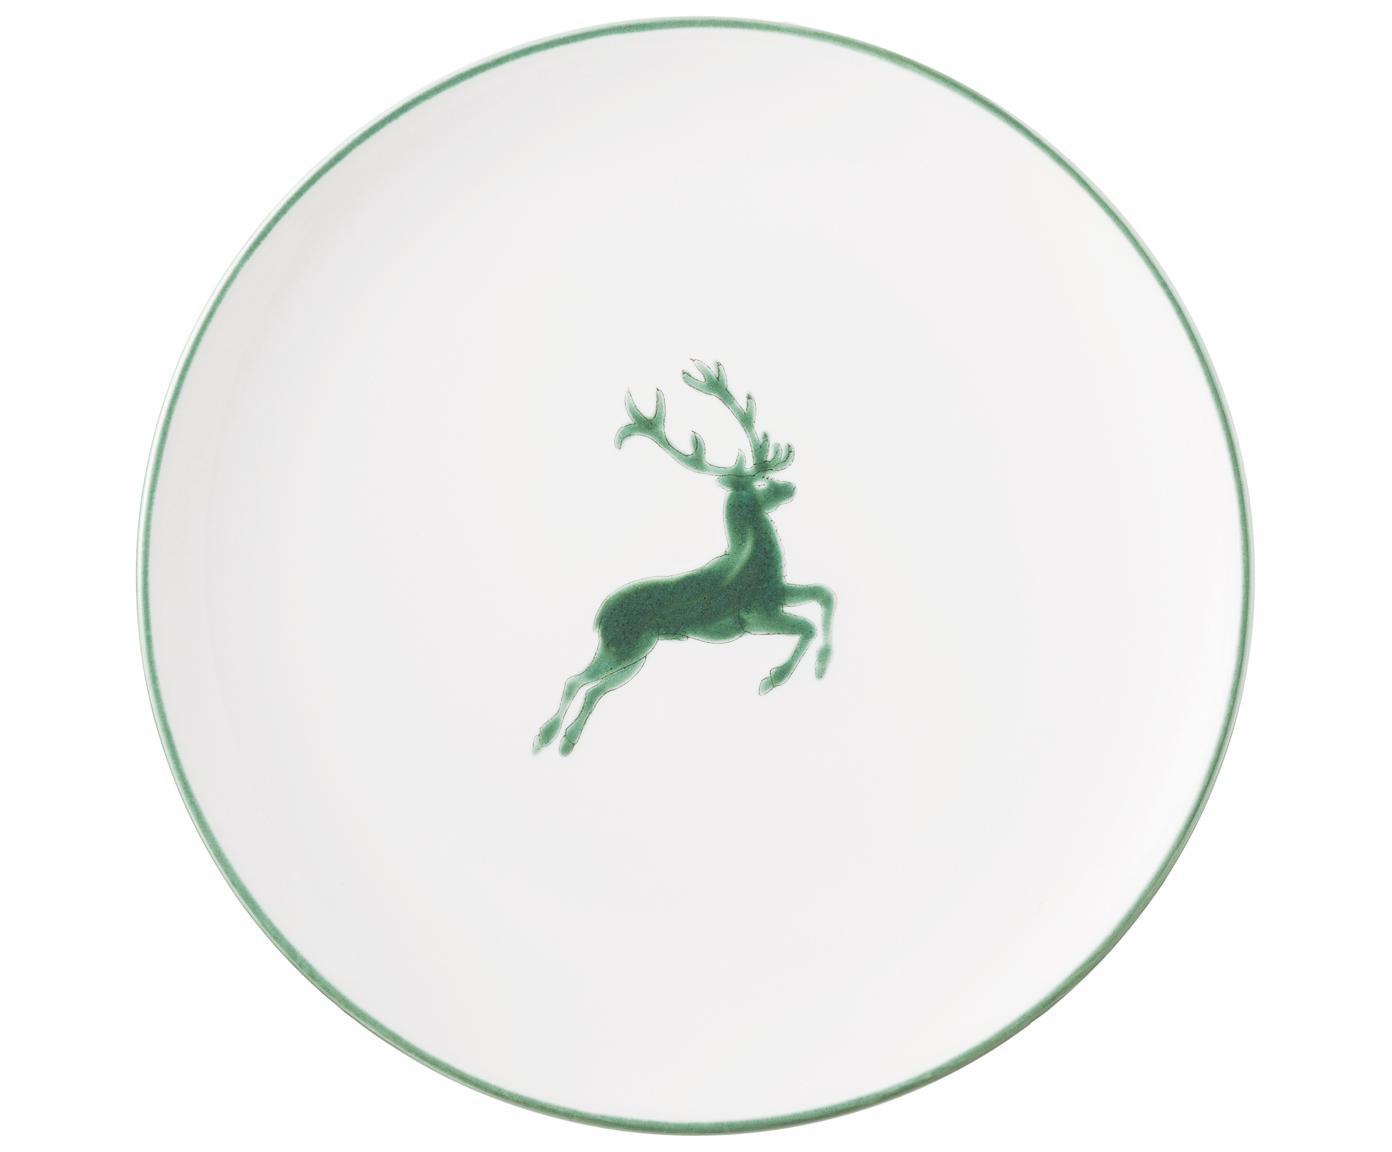 Handbemalter Speiseteller Classic Grüner Hirsch, Keramik, Weiß, Ø 25 cm